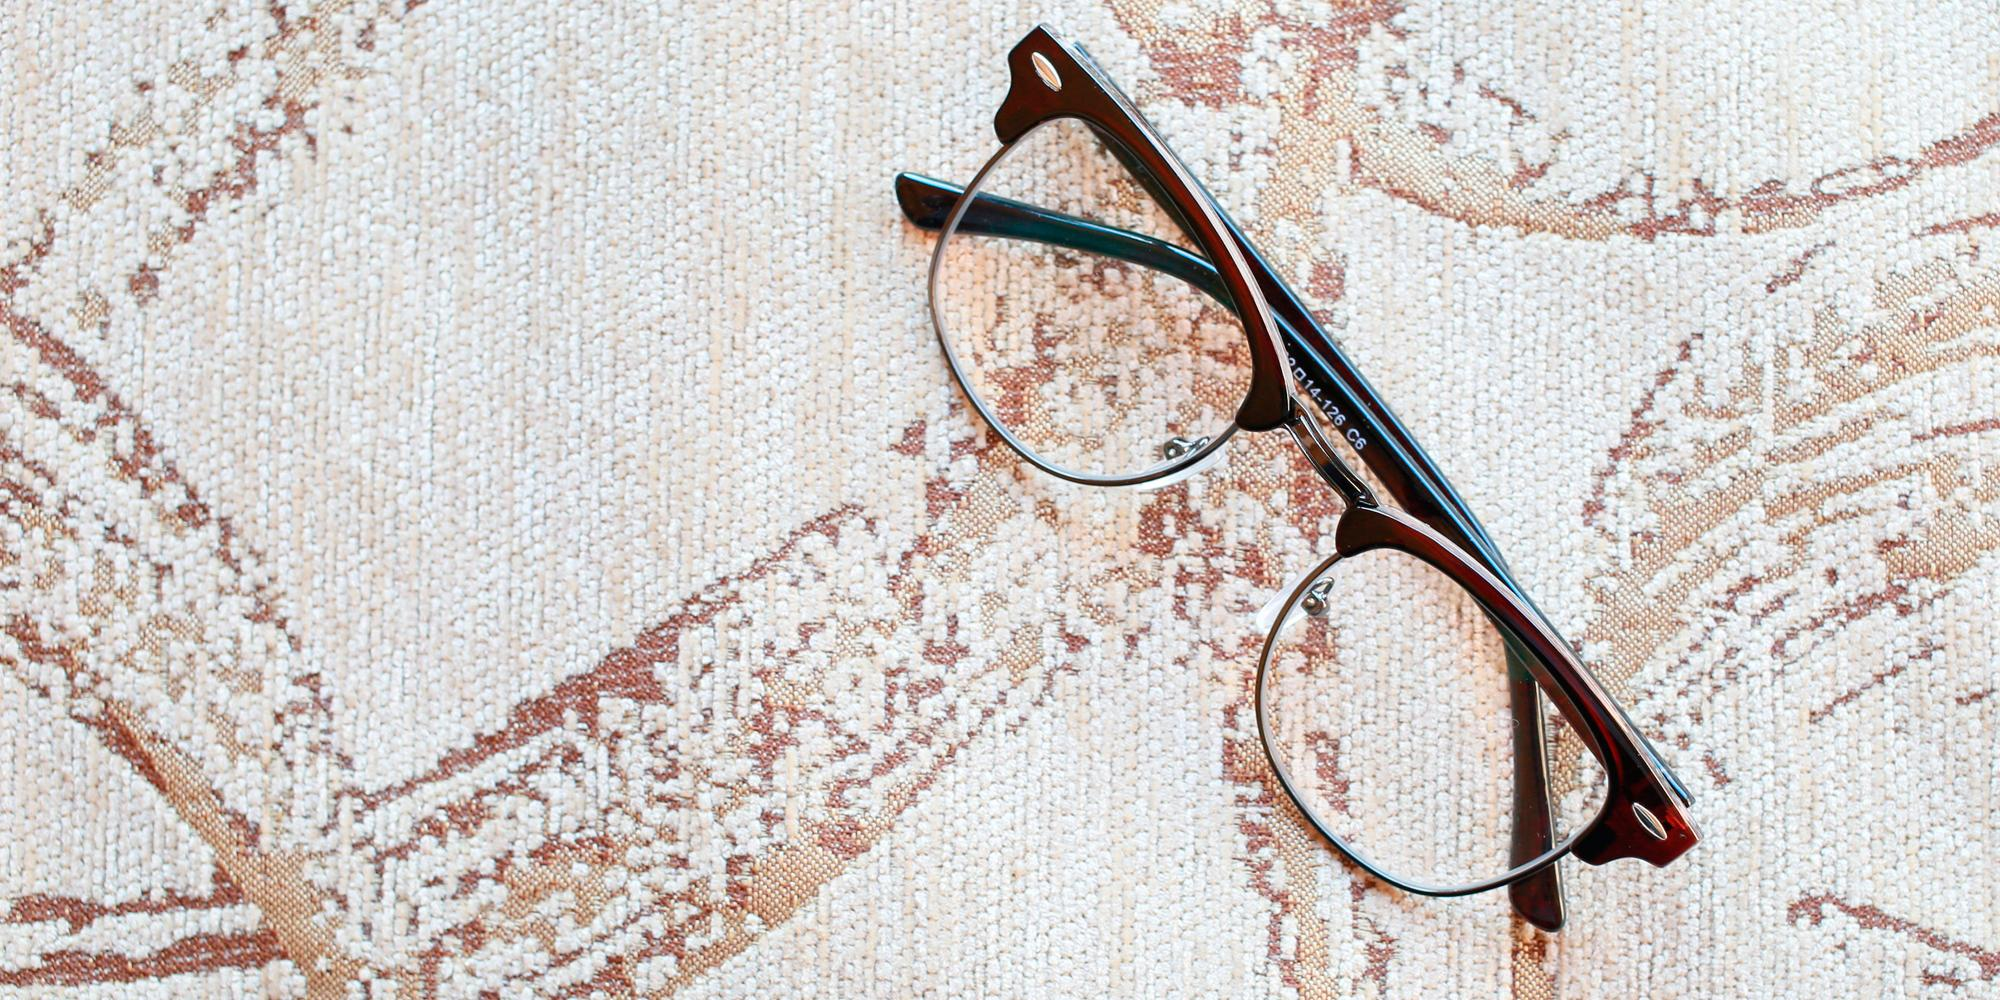 infinity-horn-rimmed-budget-prescription-glasses